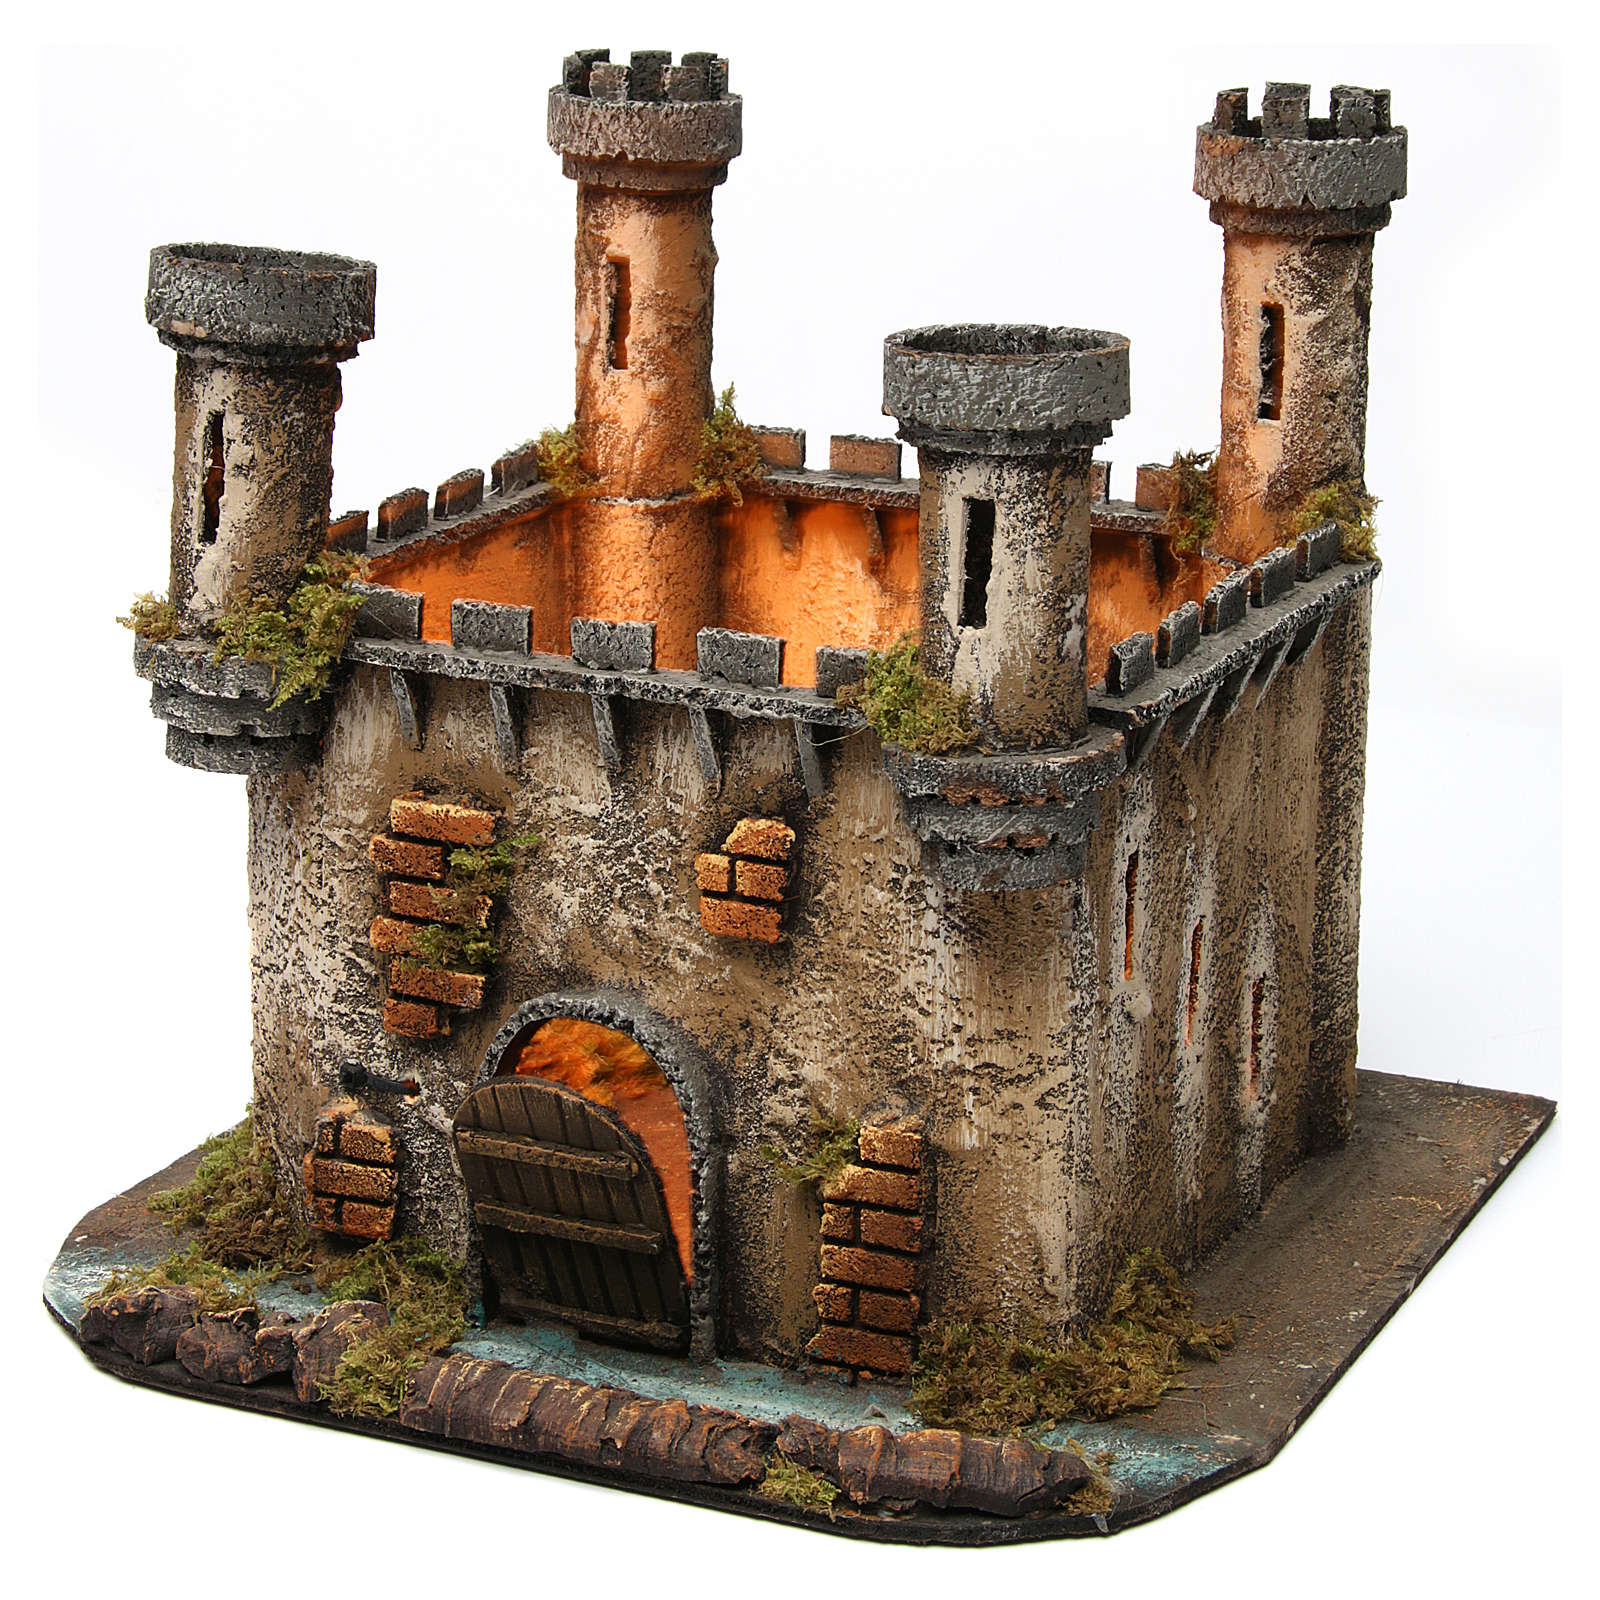 Illuminated castle with 4 towers for Neapolitan Nativity Scene 27x30x30 4